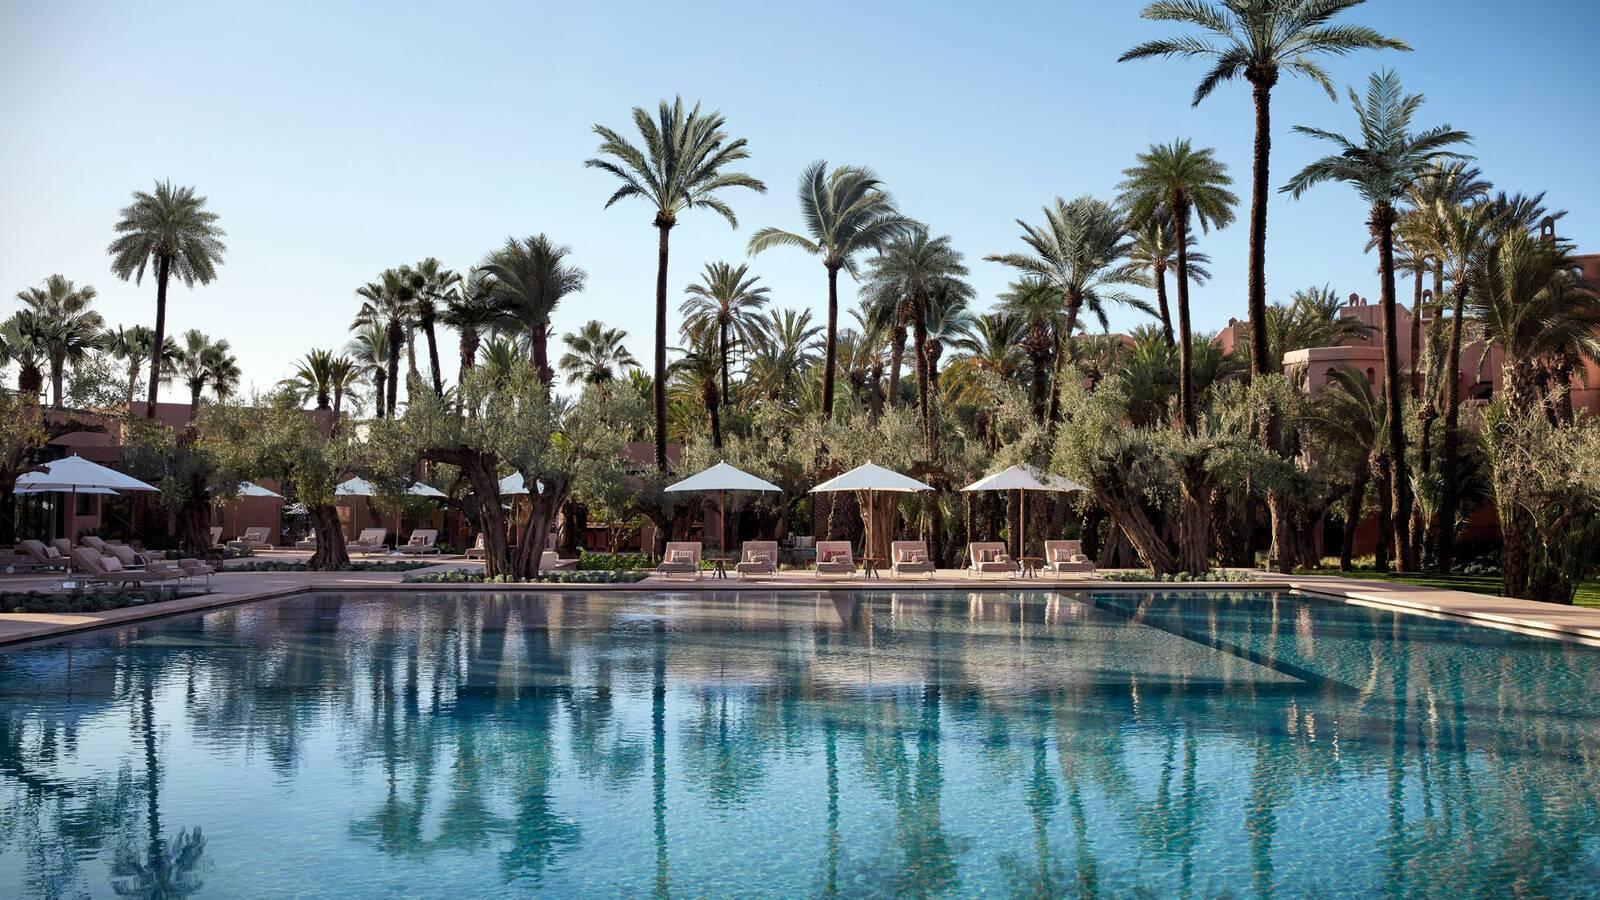 Royal Mansour Piscine Marrakech Maroc